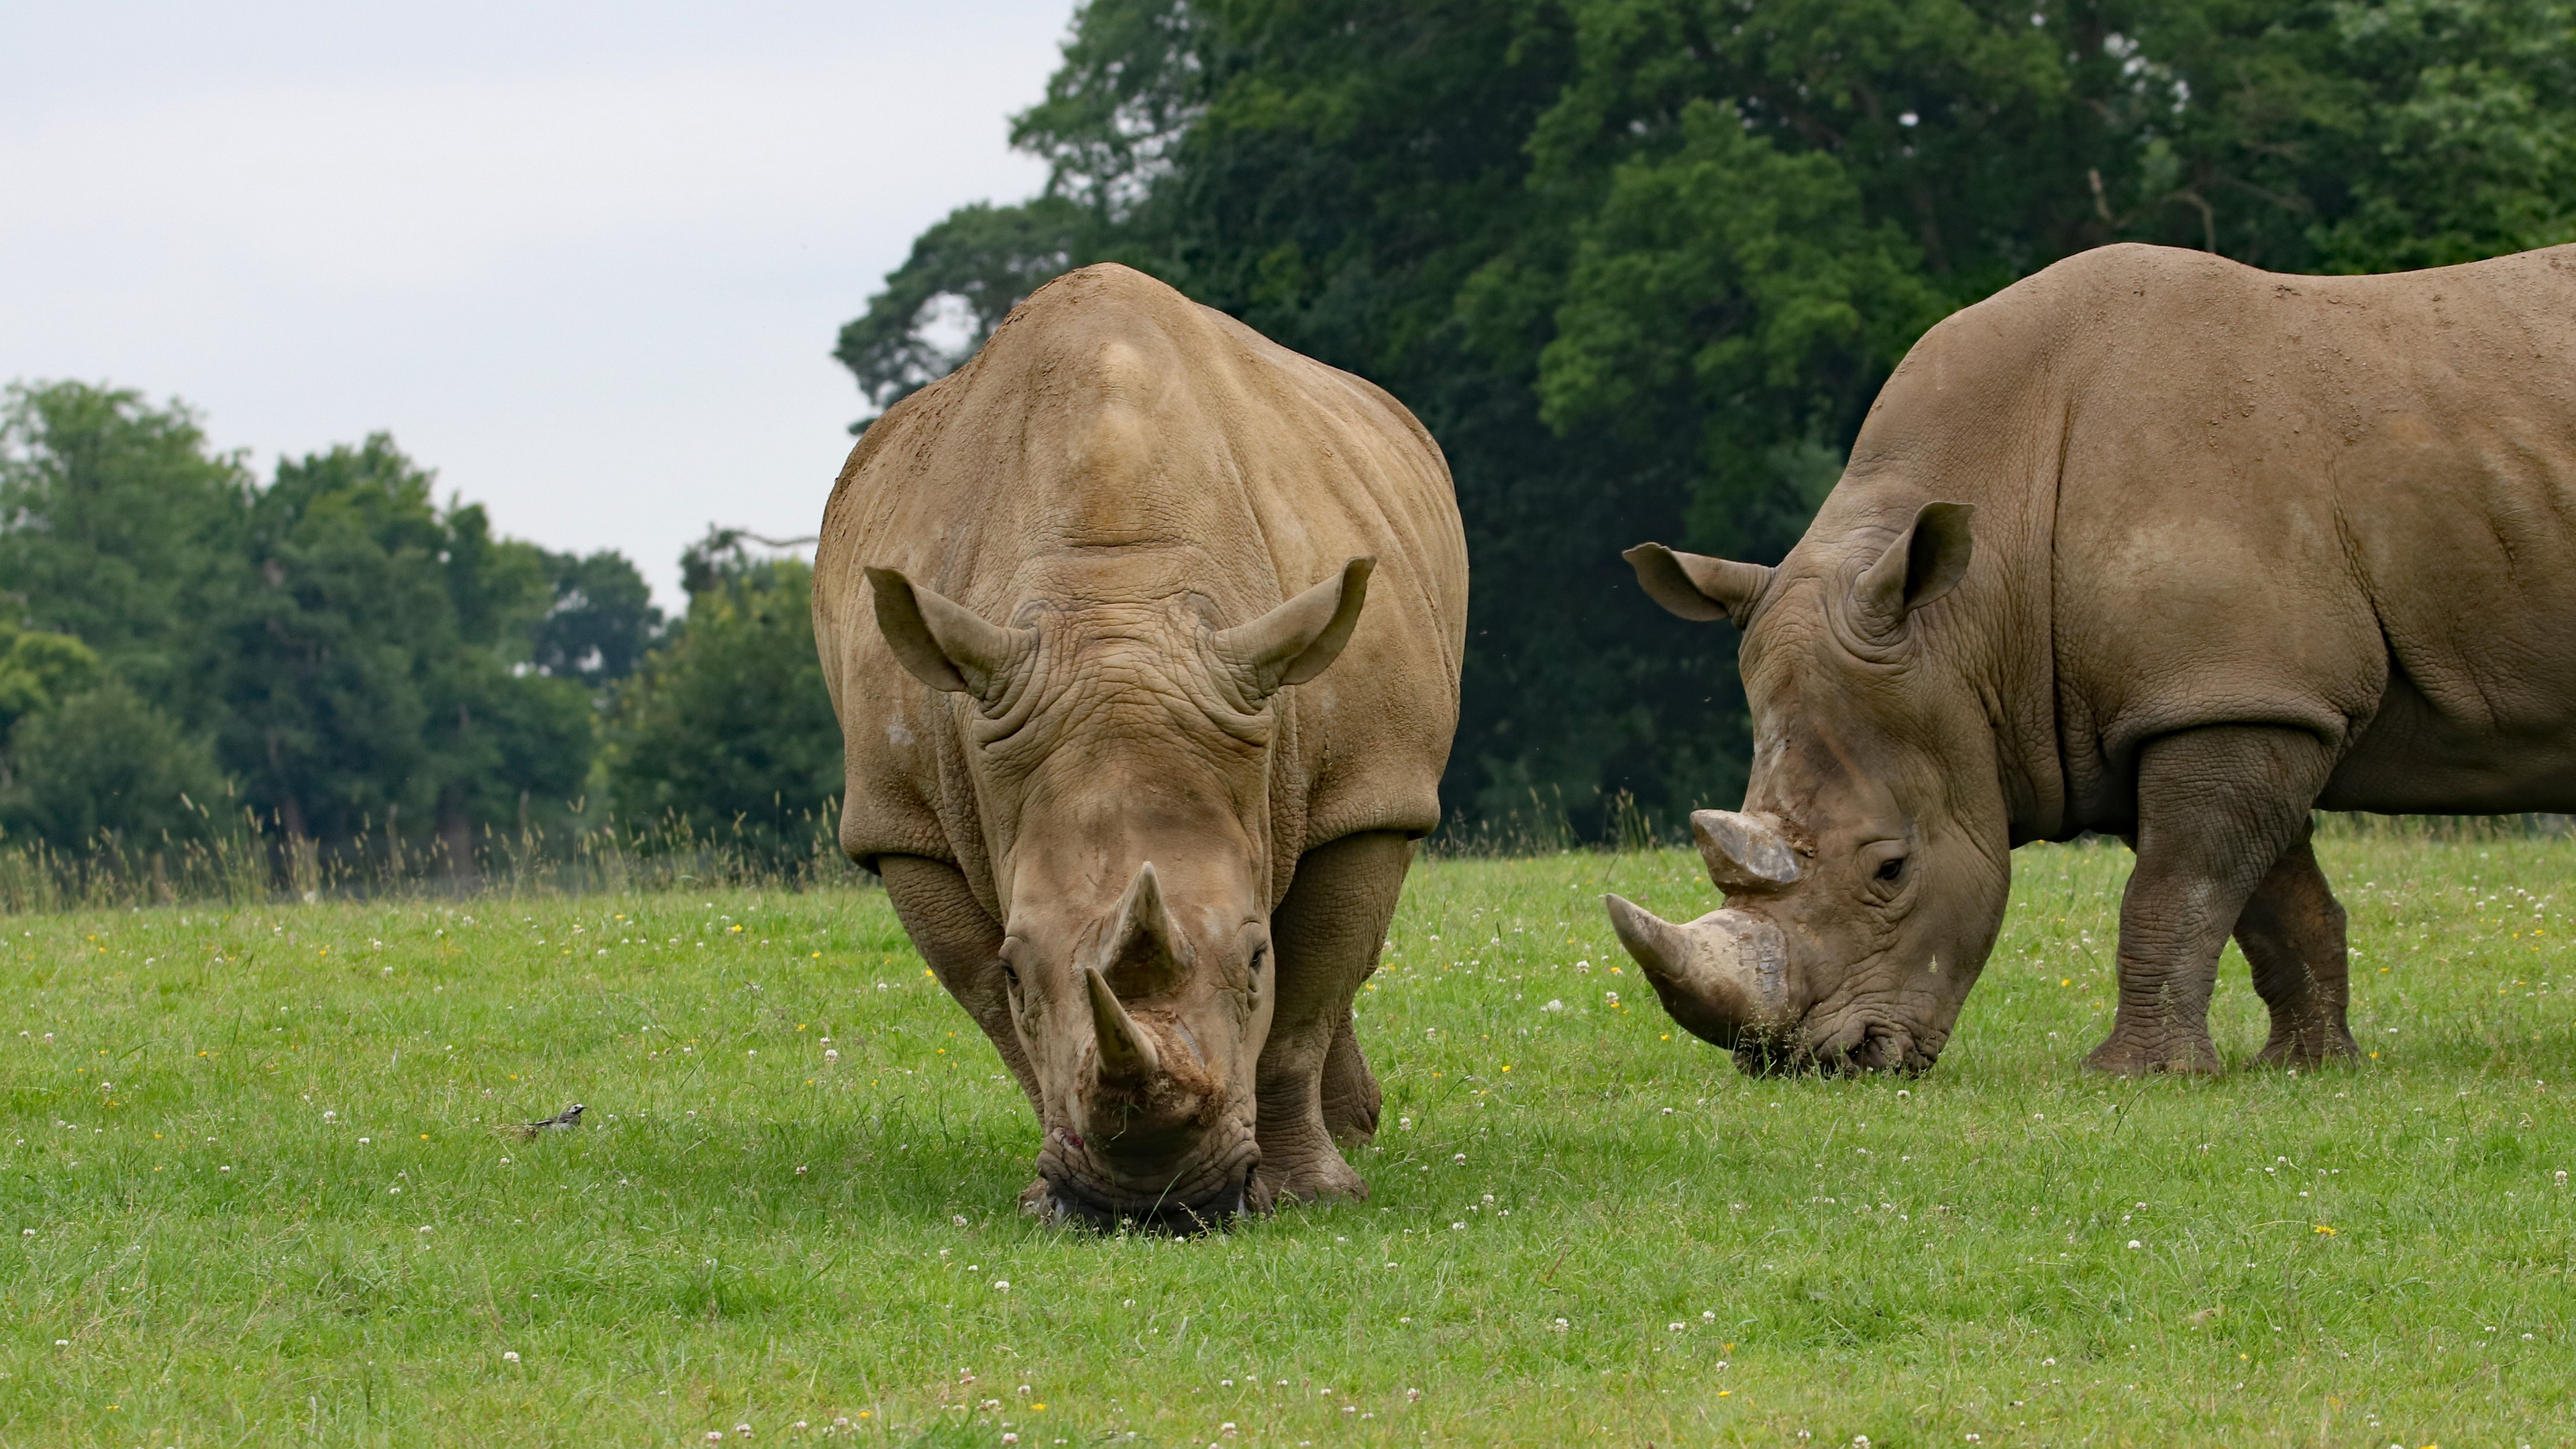 rhino couple food grass 4k 1542242439 - rhino, couple, food, grass 4k - rhino, food, Couple